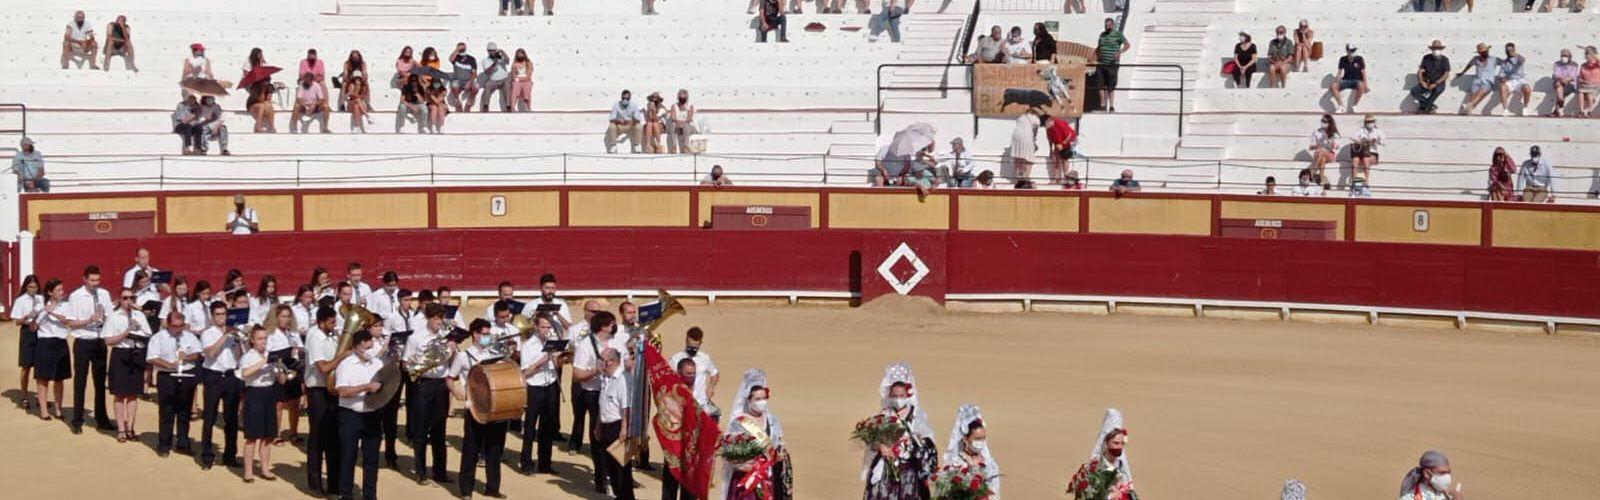 Fotos: corrida de rejones en Vinaròs